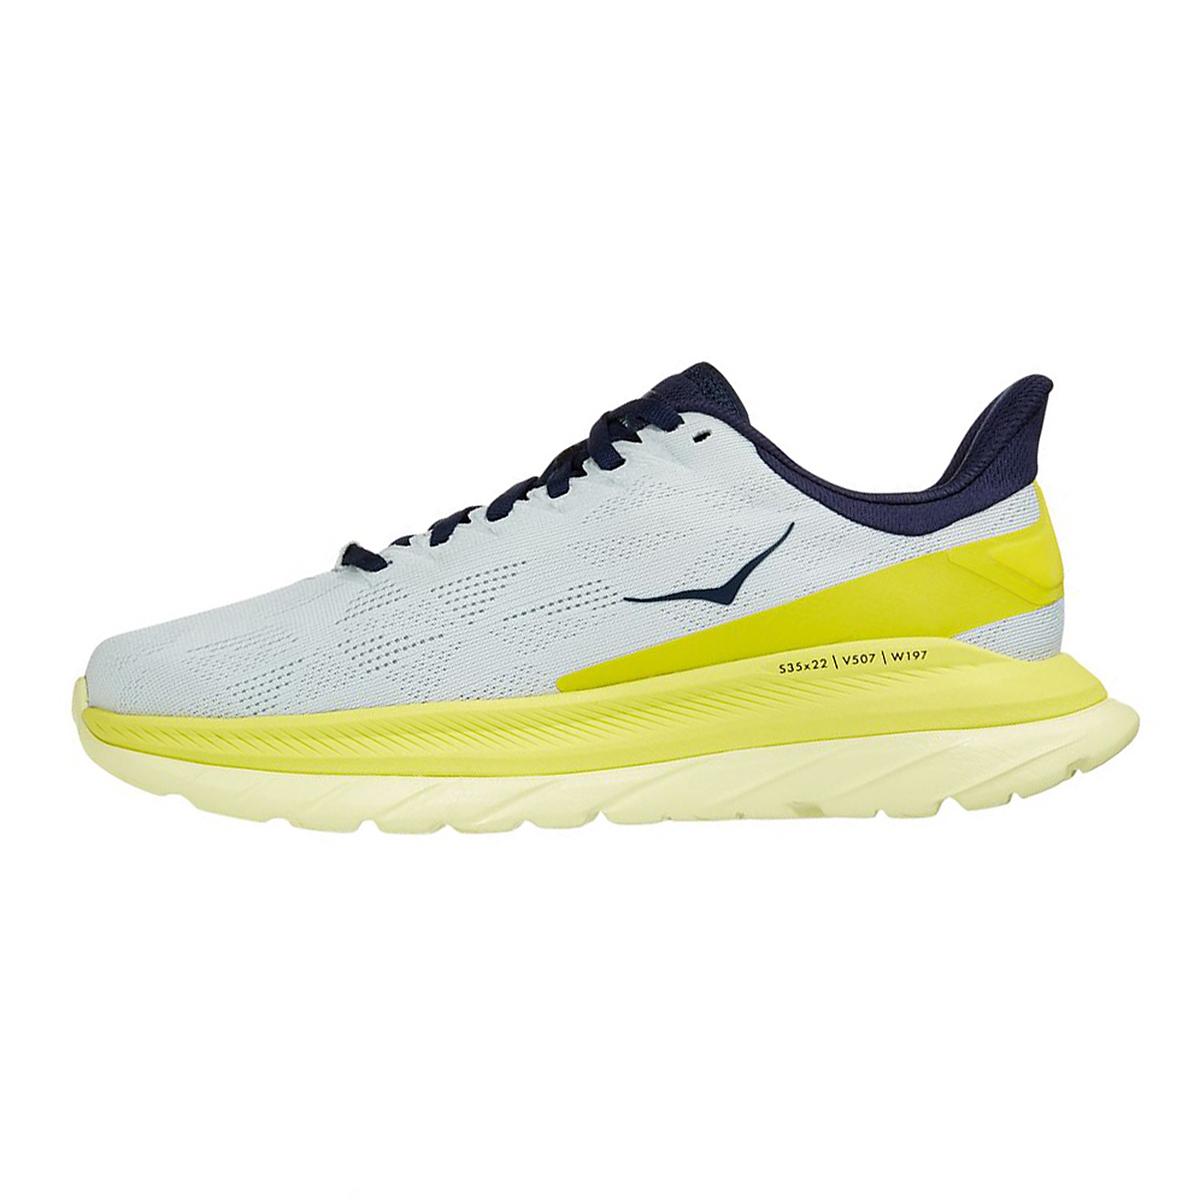 Women's Hoka One One Mach 4 Running Shoe - Color: Blue Flower/Citrus - Size: 5 - Width: Regular, Blue Flower/Citrus, large, image 2